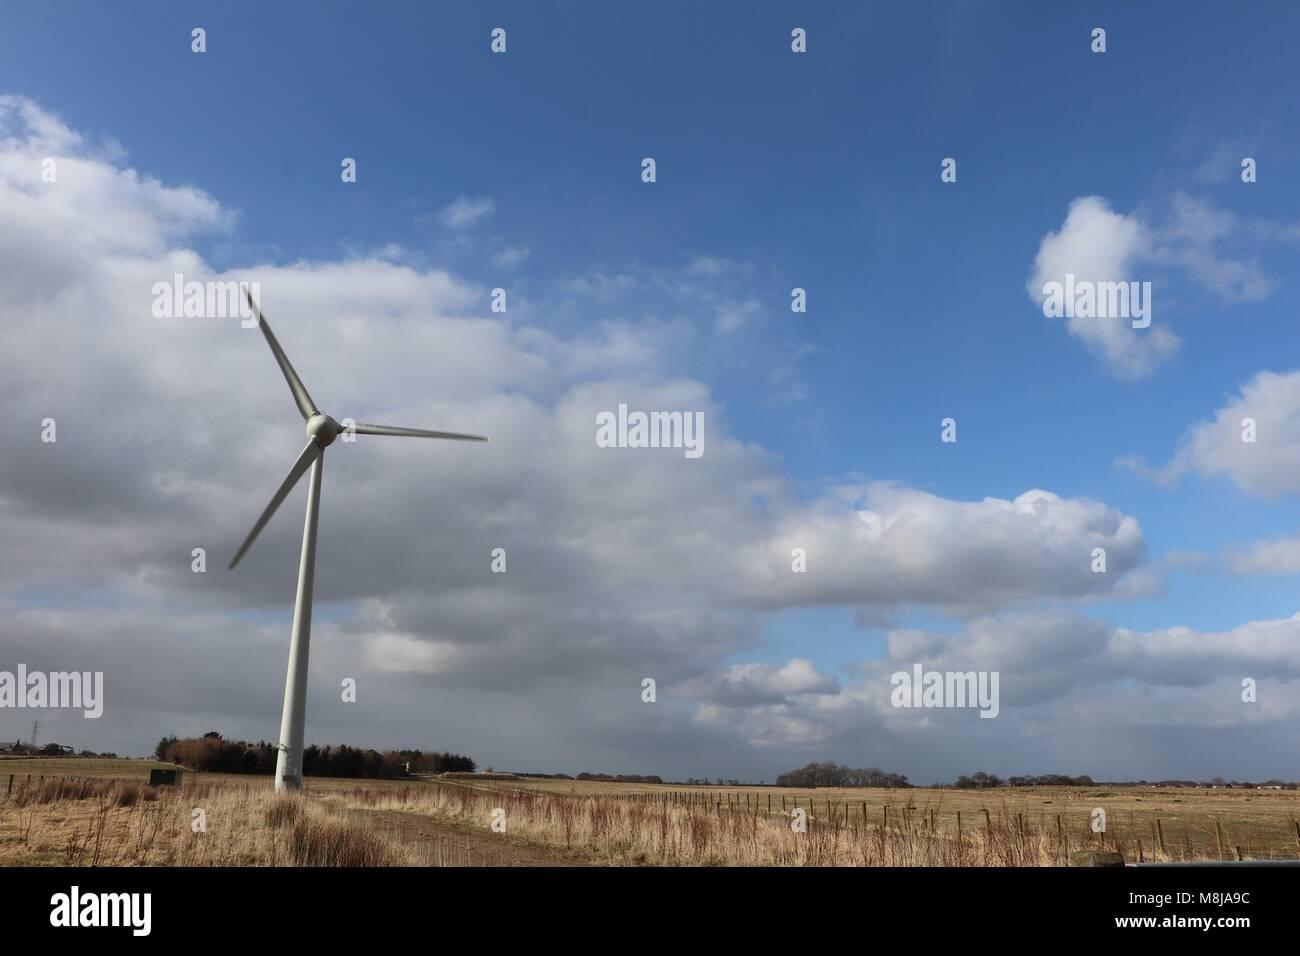 Wind turbines in rural setting, renewable energy, electricity generators, alternative power, environmentally friendly - Stock Image